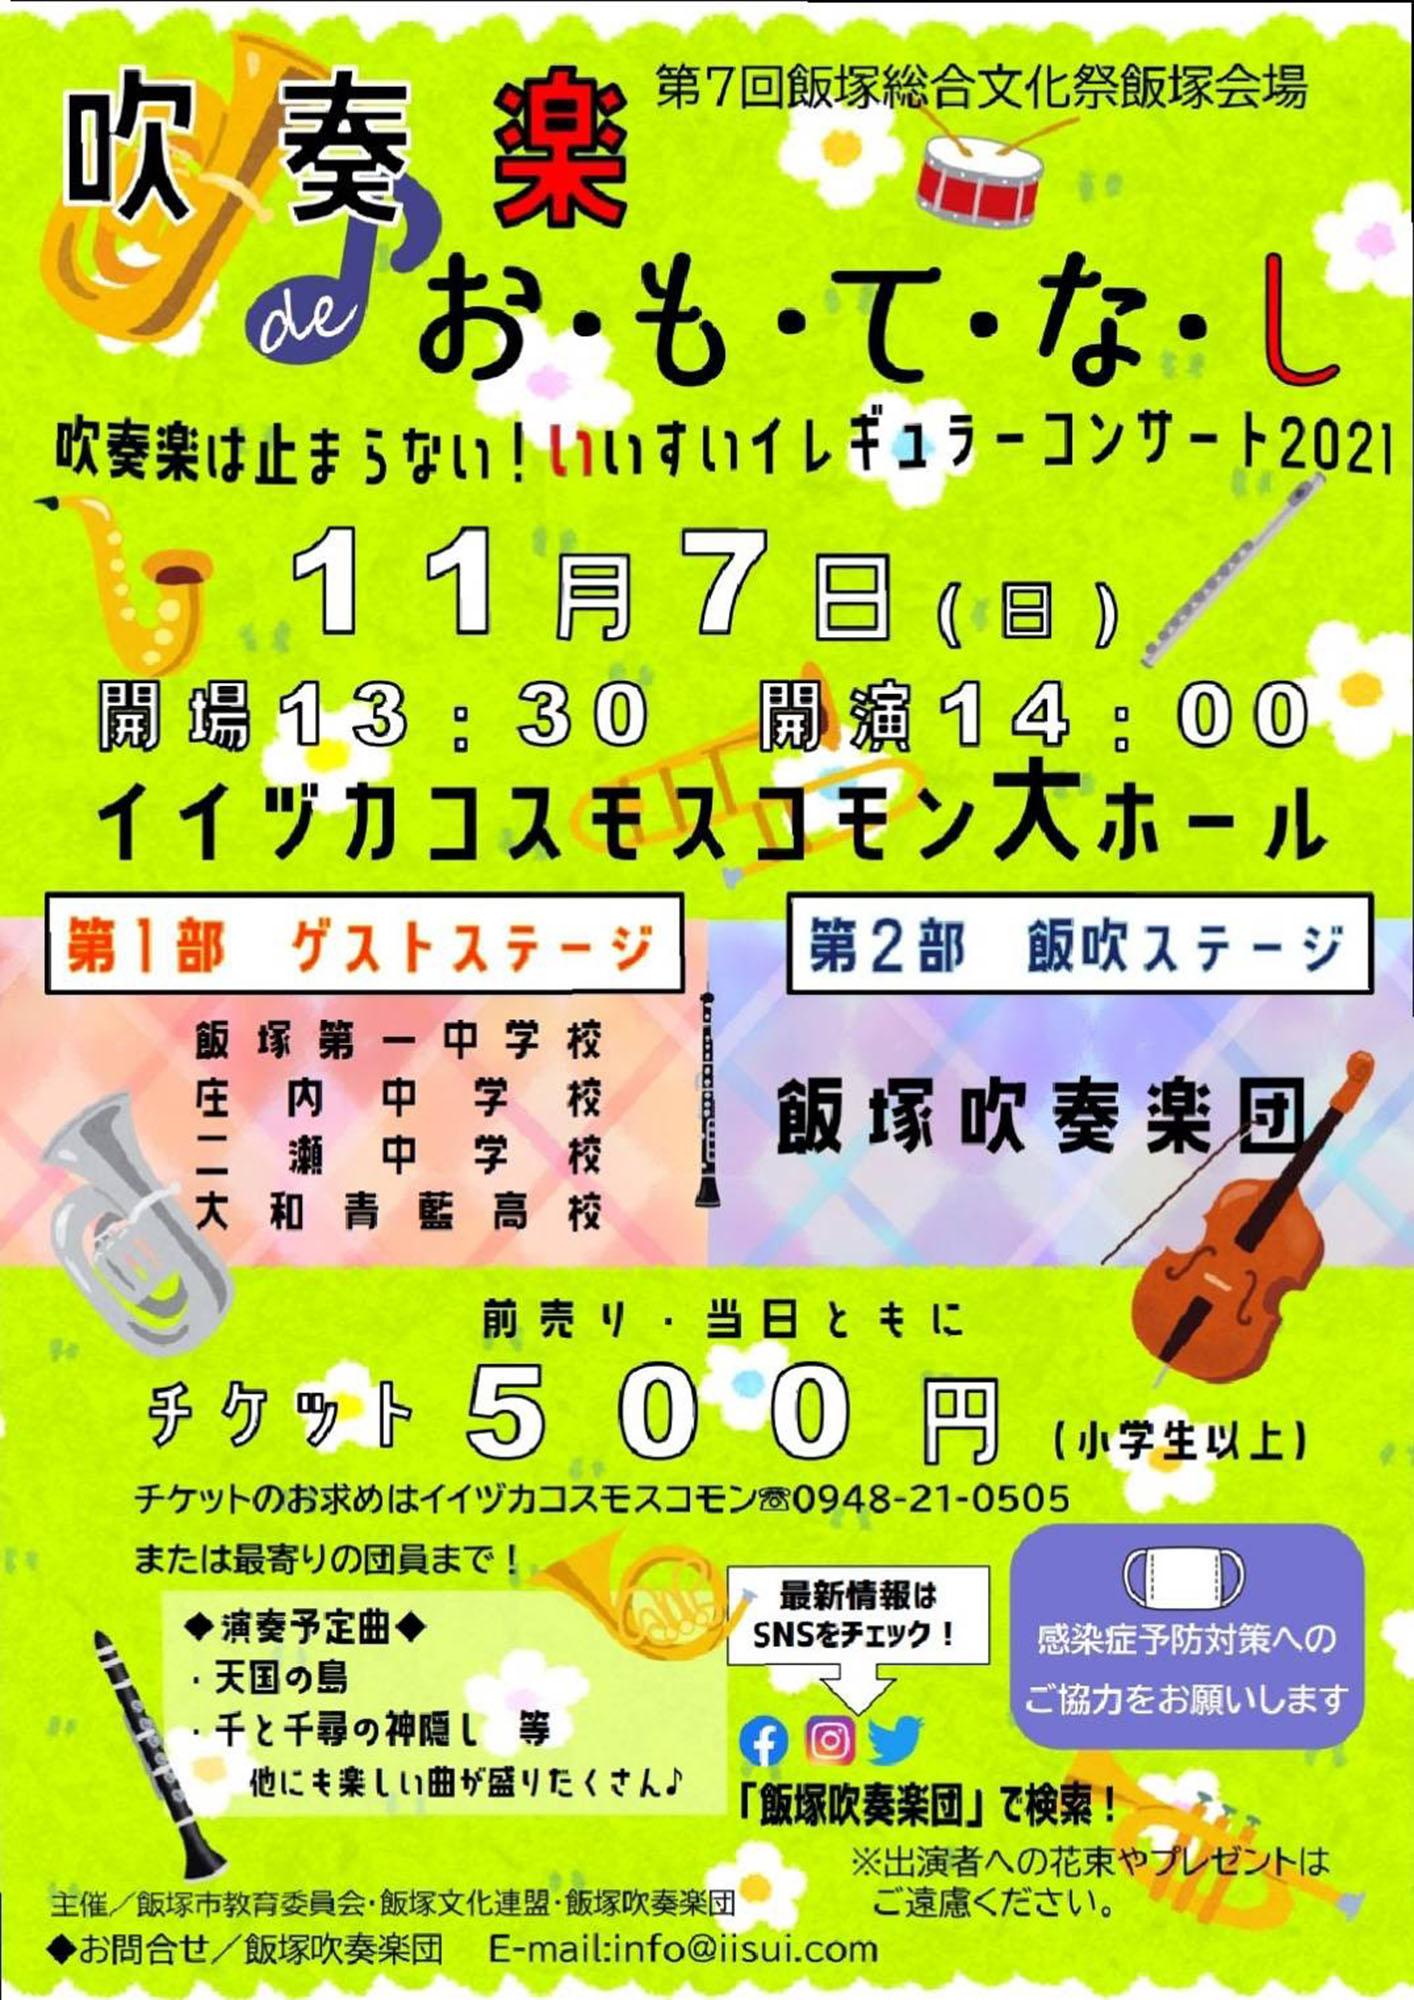 20211107_iisui_irregular _concert